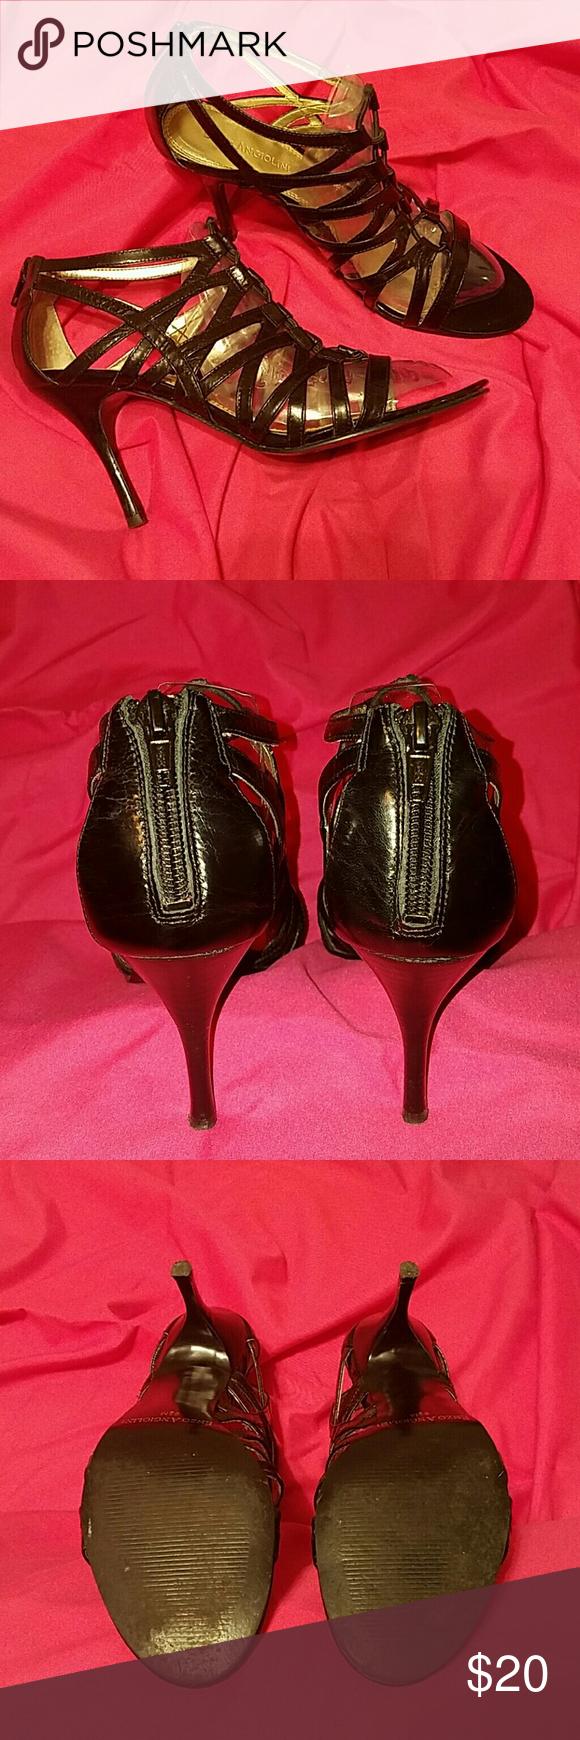 Black sandals 2 inch heel - Black Sandals 2 Inch Heel 29